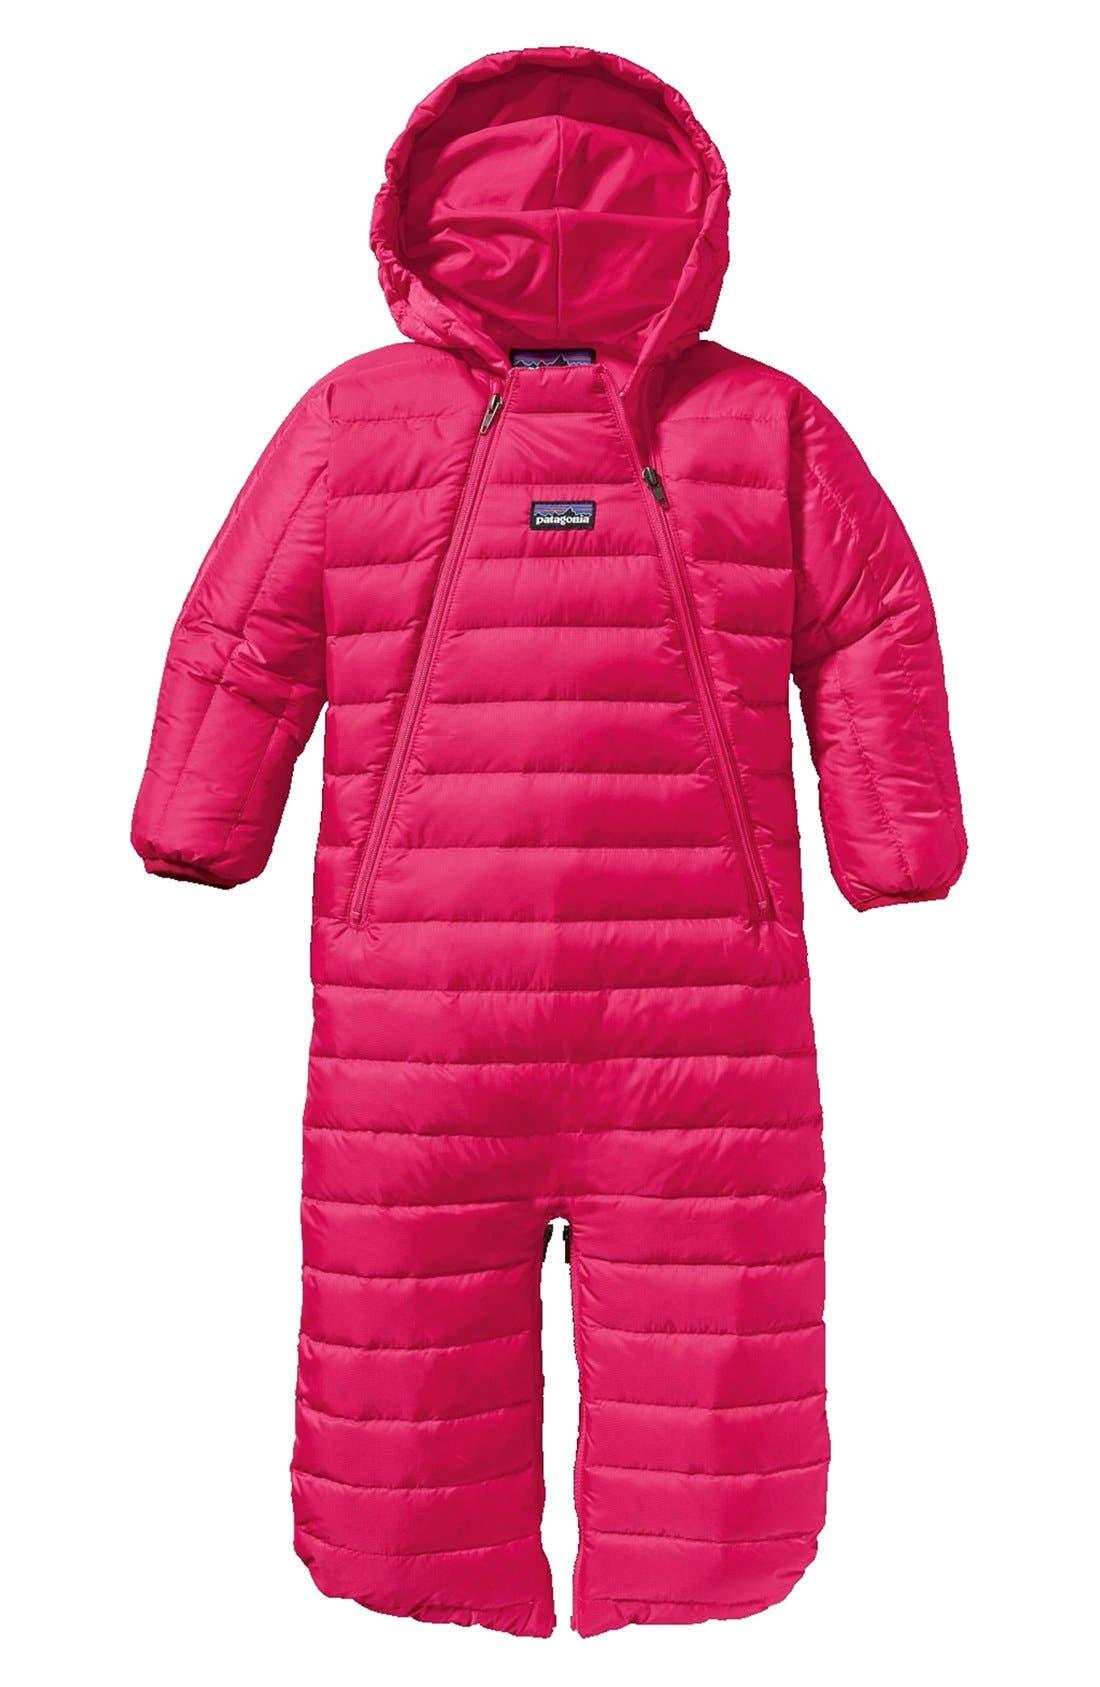 Alternate Image 1 Selected - Patagonia Down Sweater Bunting (Baby Girls)